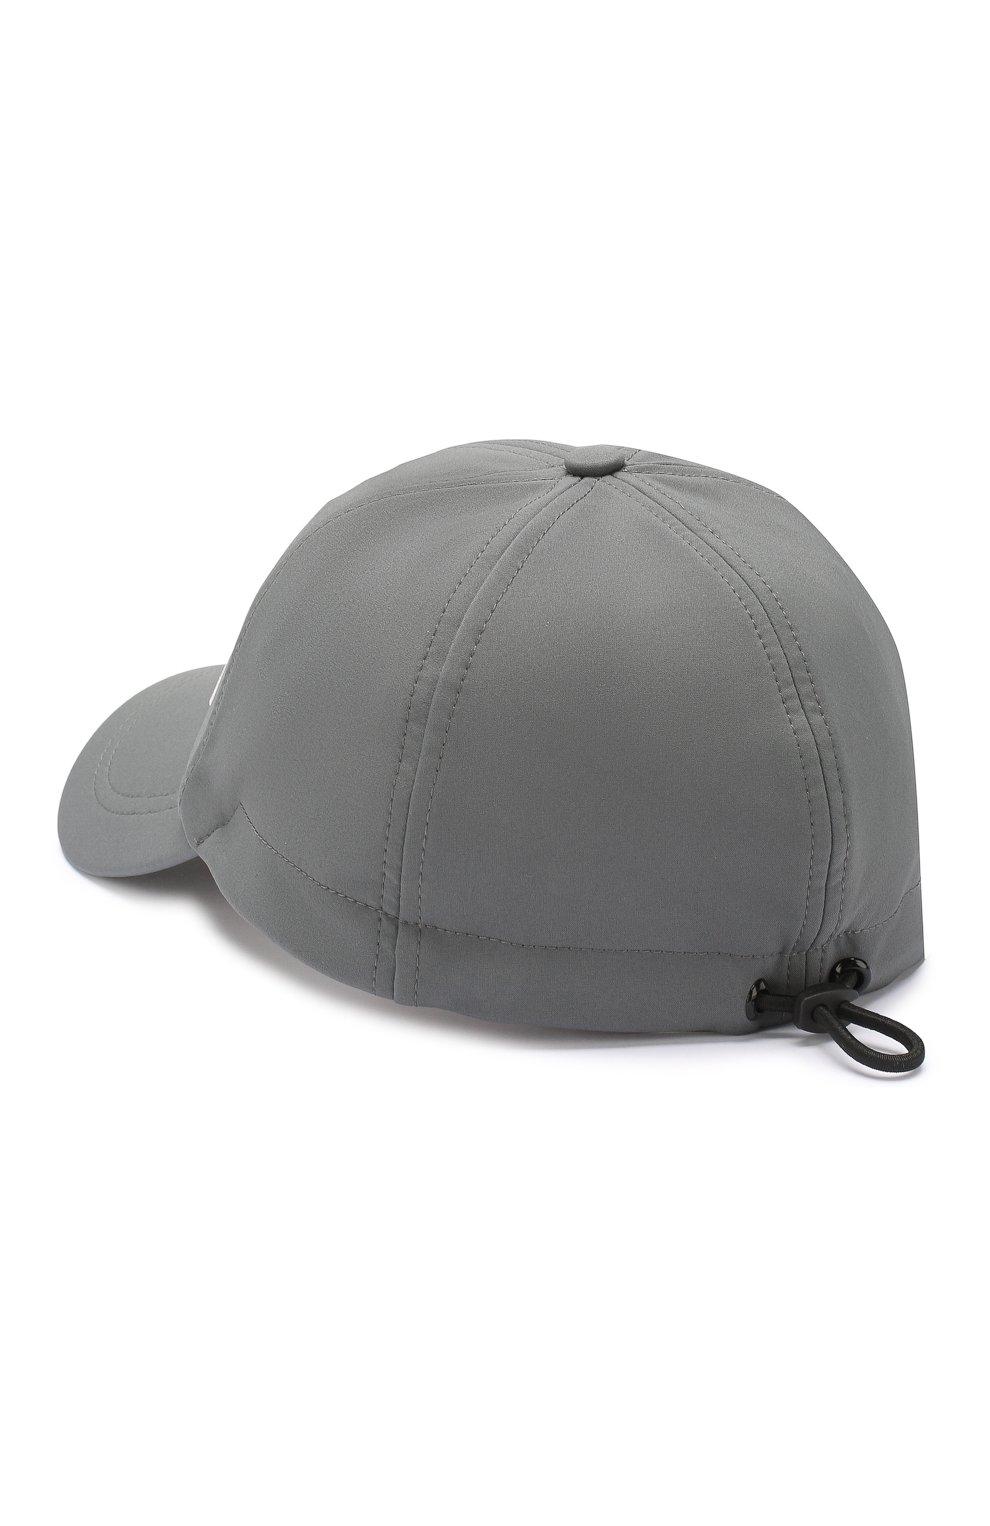 Мужской бейсболка STONE ISLAND темно-серого цвета, арт. 721599227 | Фото 2